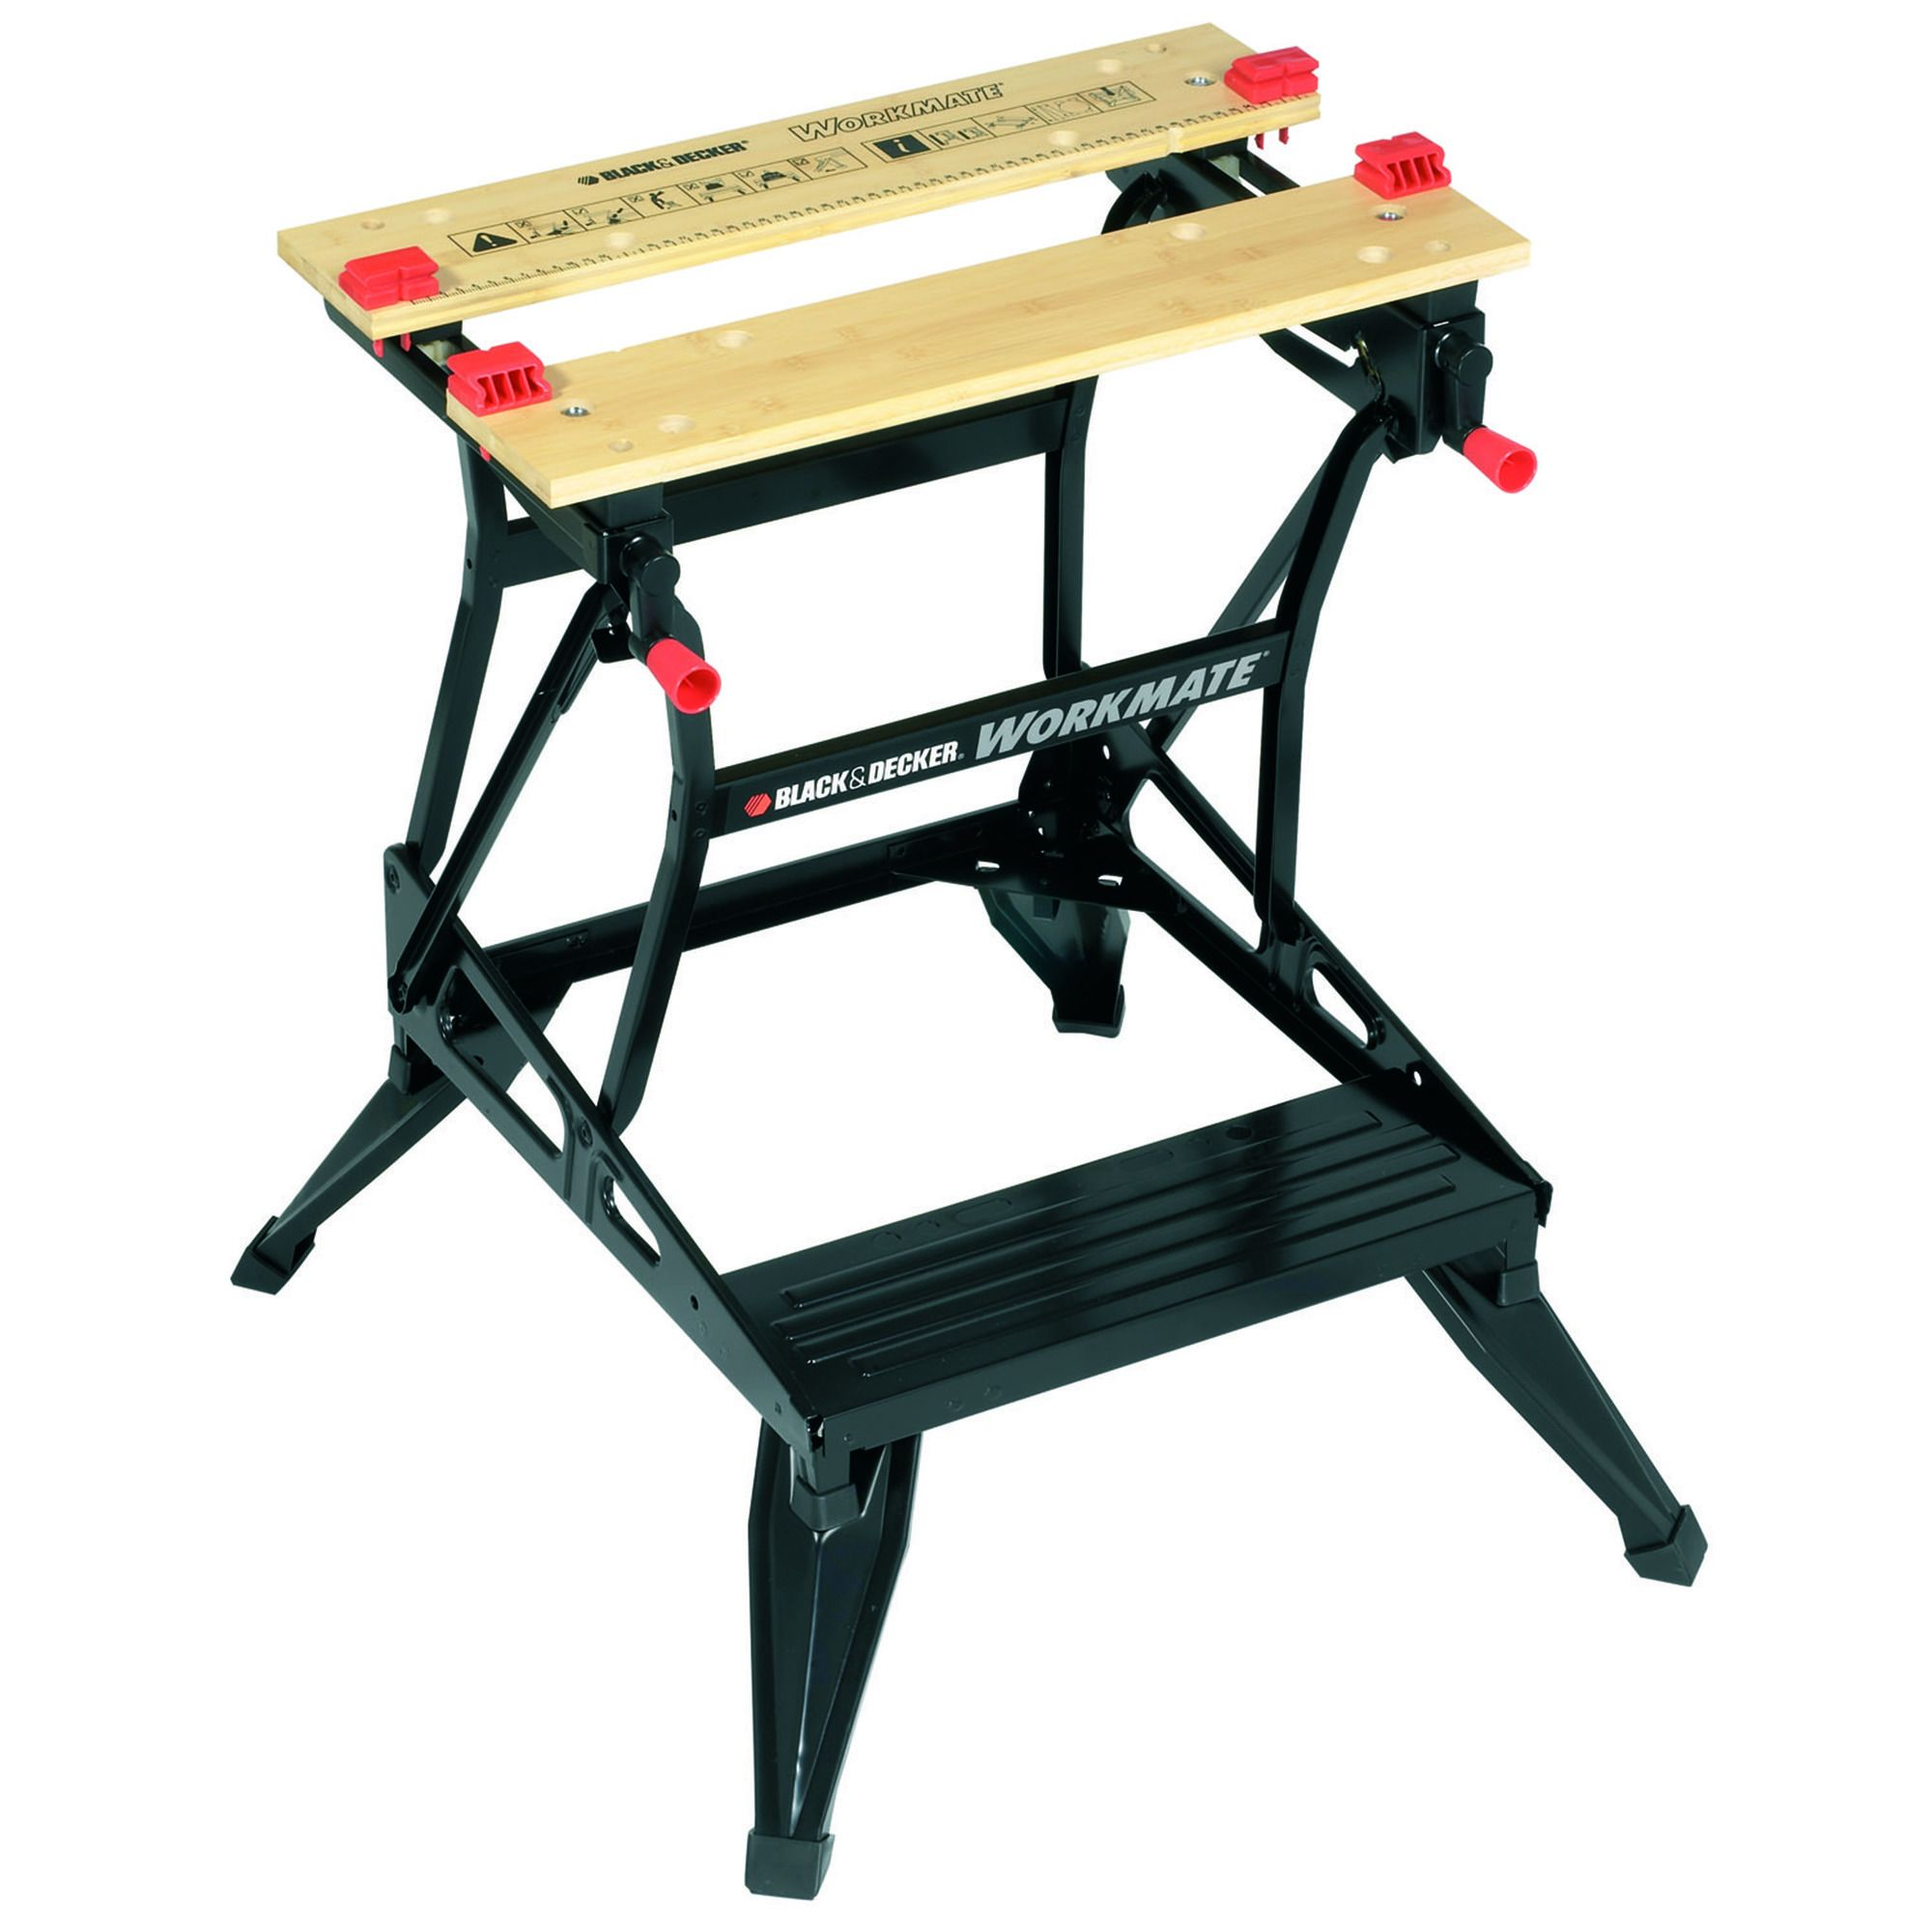 Black Decker Workmate Foldable Workbench W 170mm Departments Diy At B Q